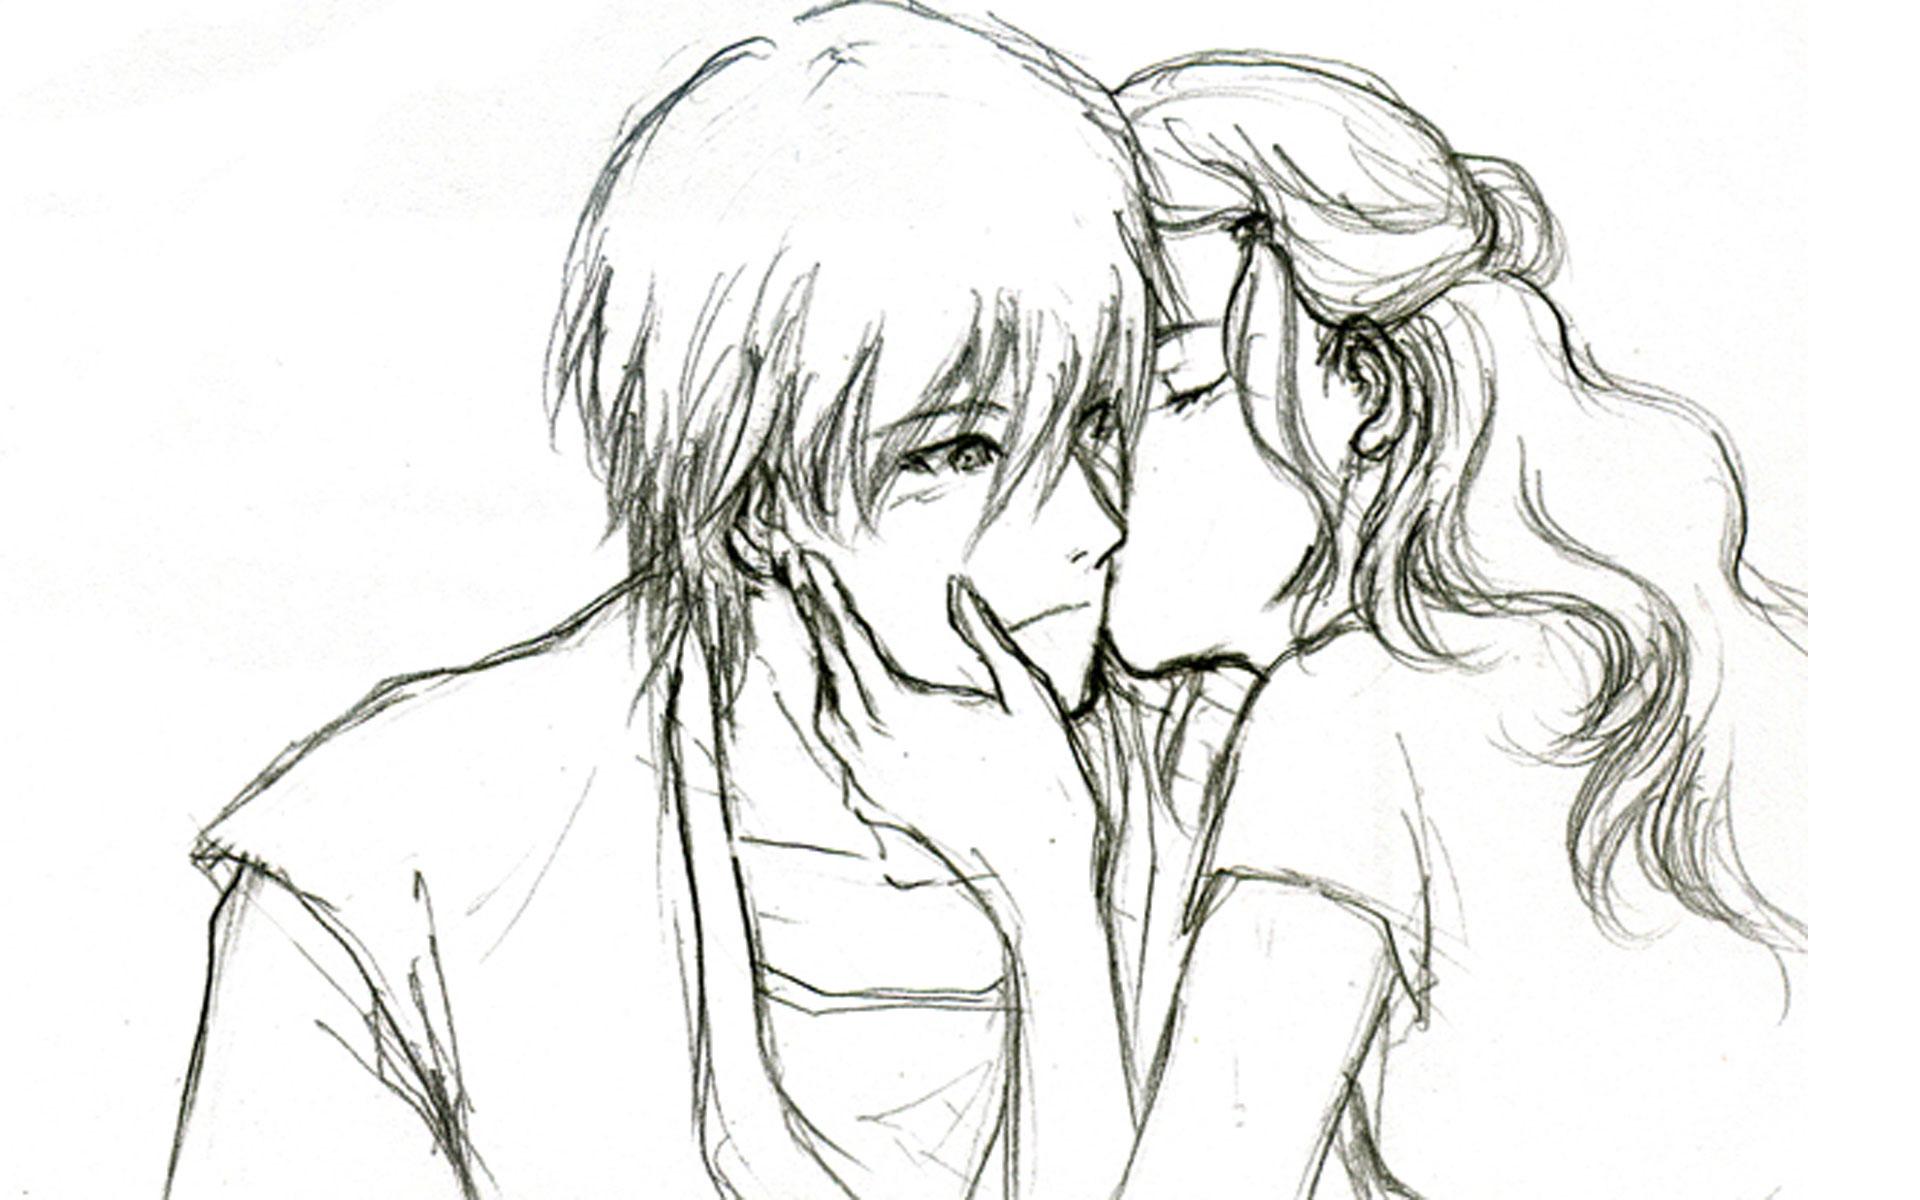 1920x1200 Kid Love Romantic Pencil Drawings Love Cute Sketch Sketch Cute